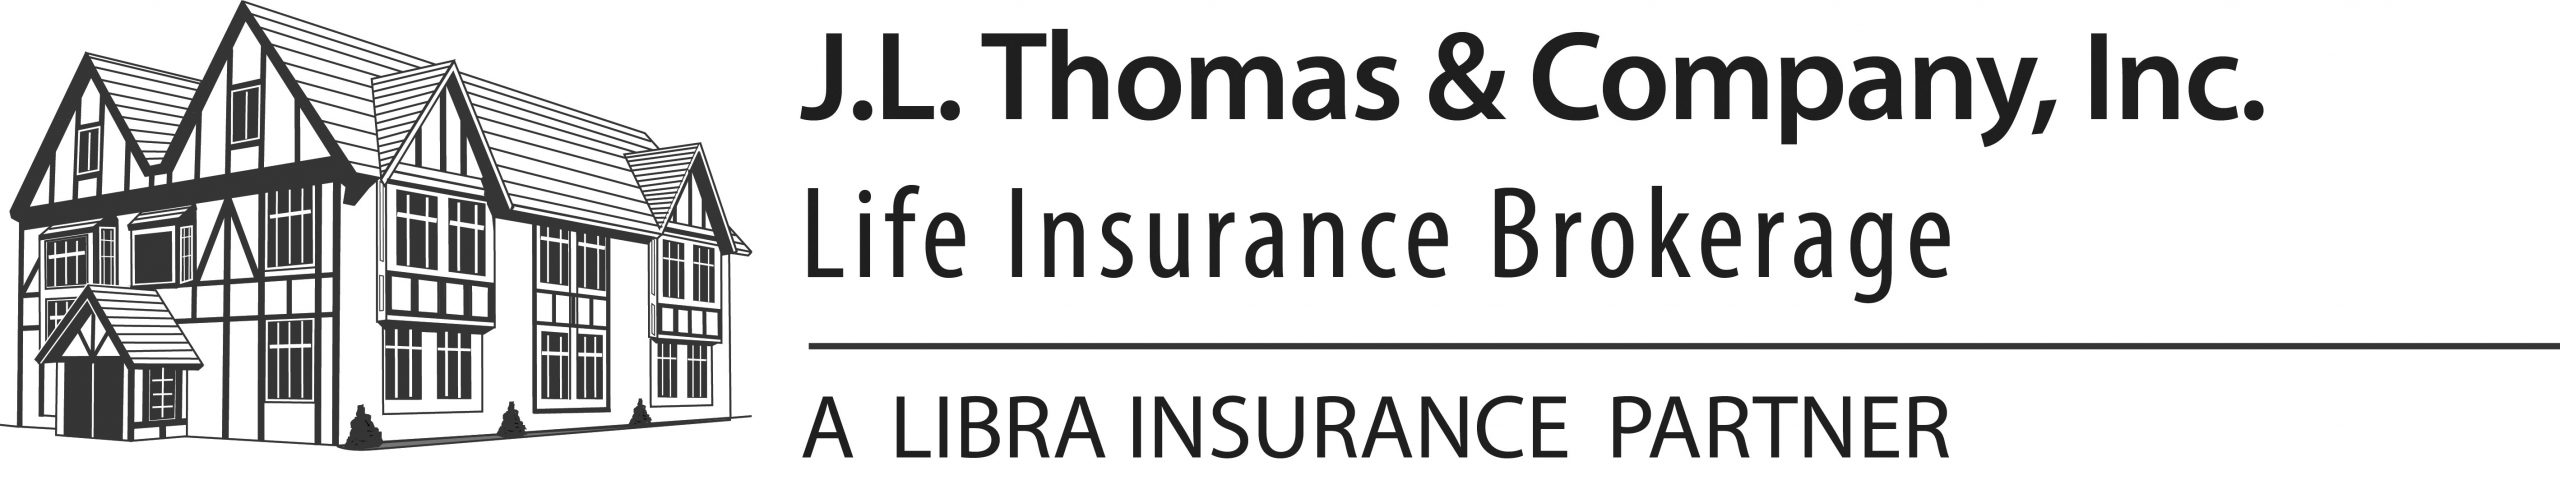 J.L.Thomas & Company, Inc.